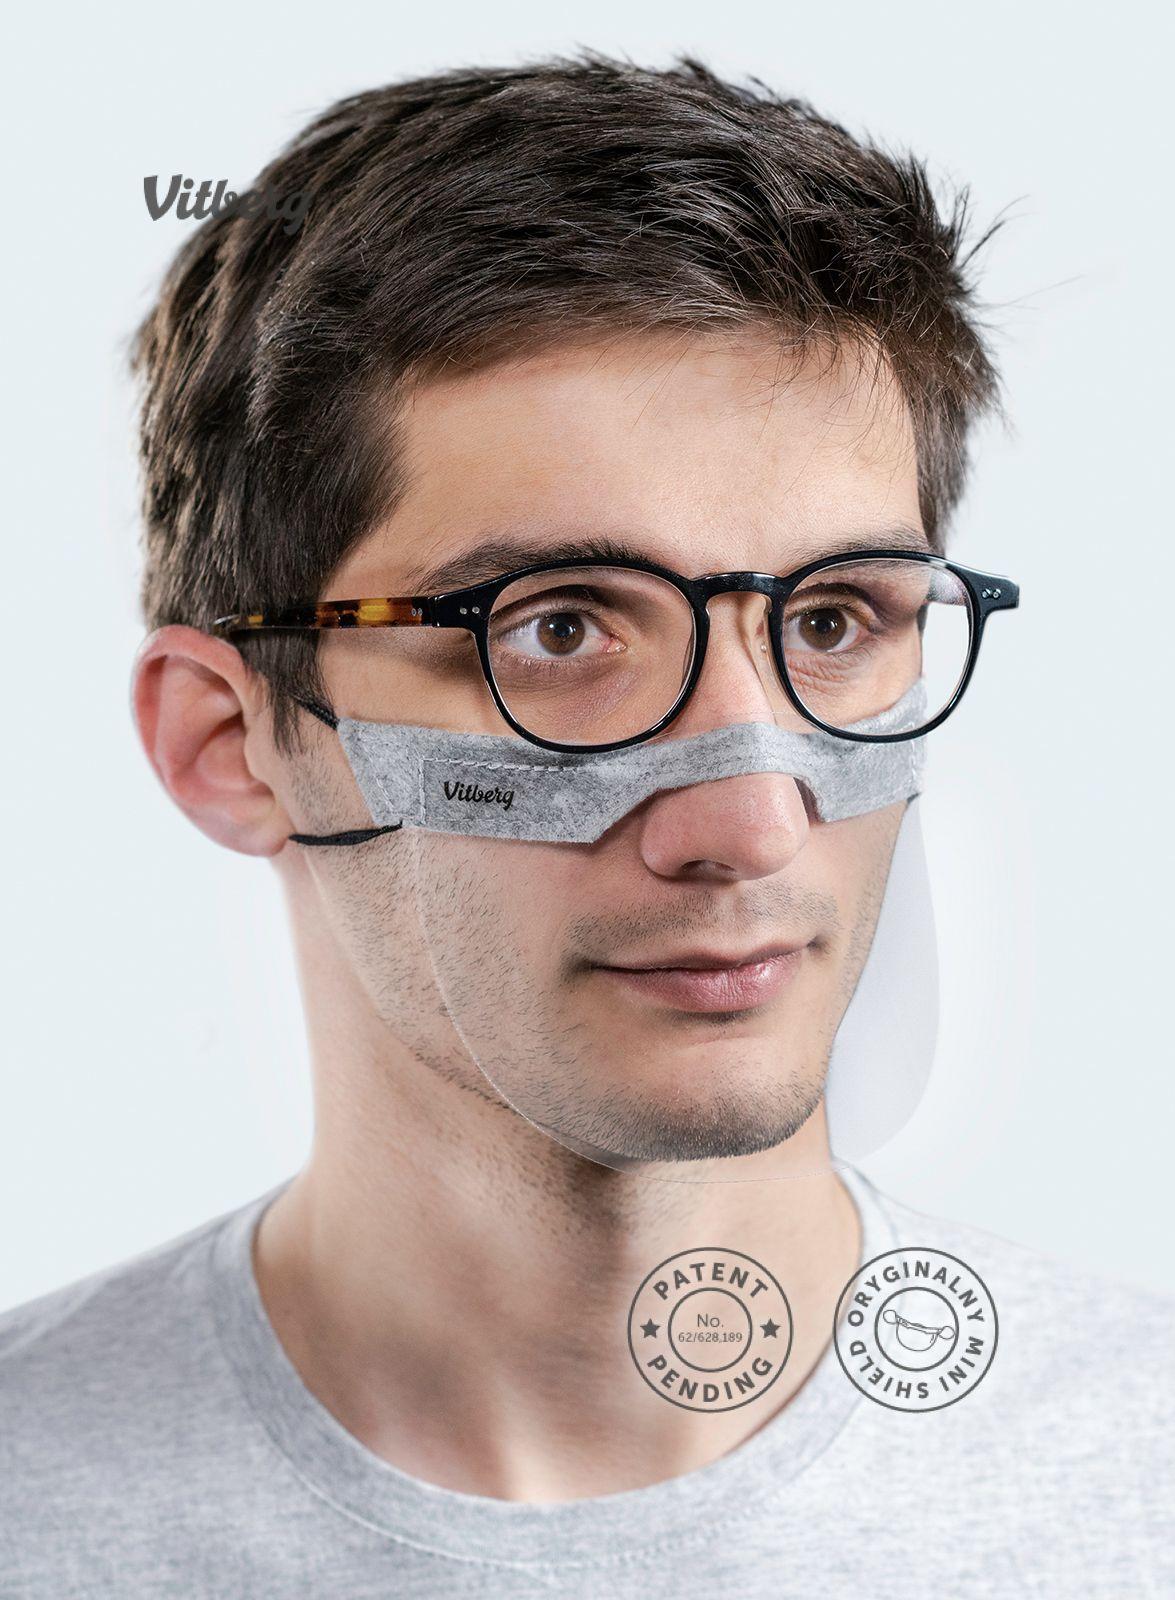 Mini przyłbica Vitberg Mini Shield maksymalnie wygodna nawet z okularami